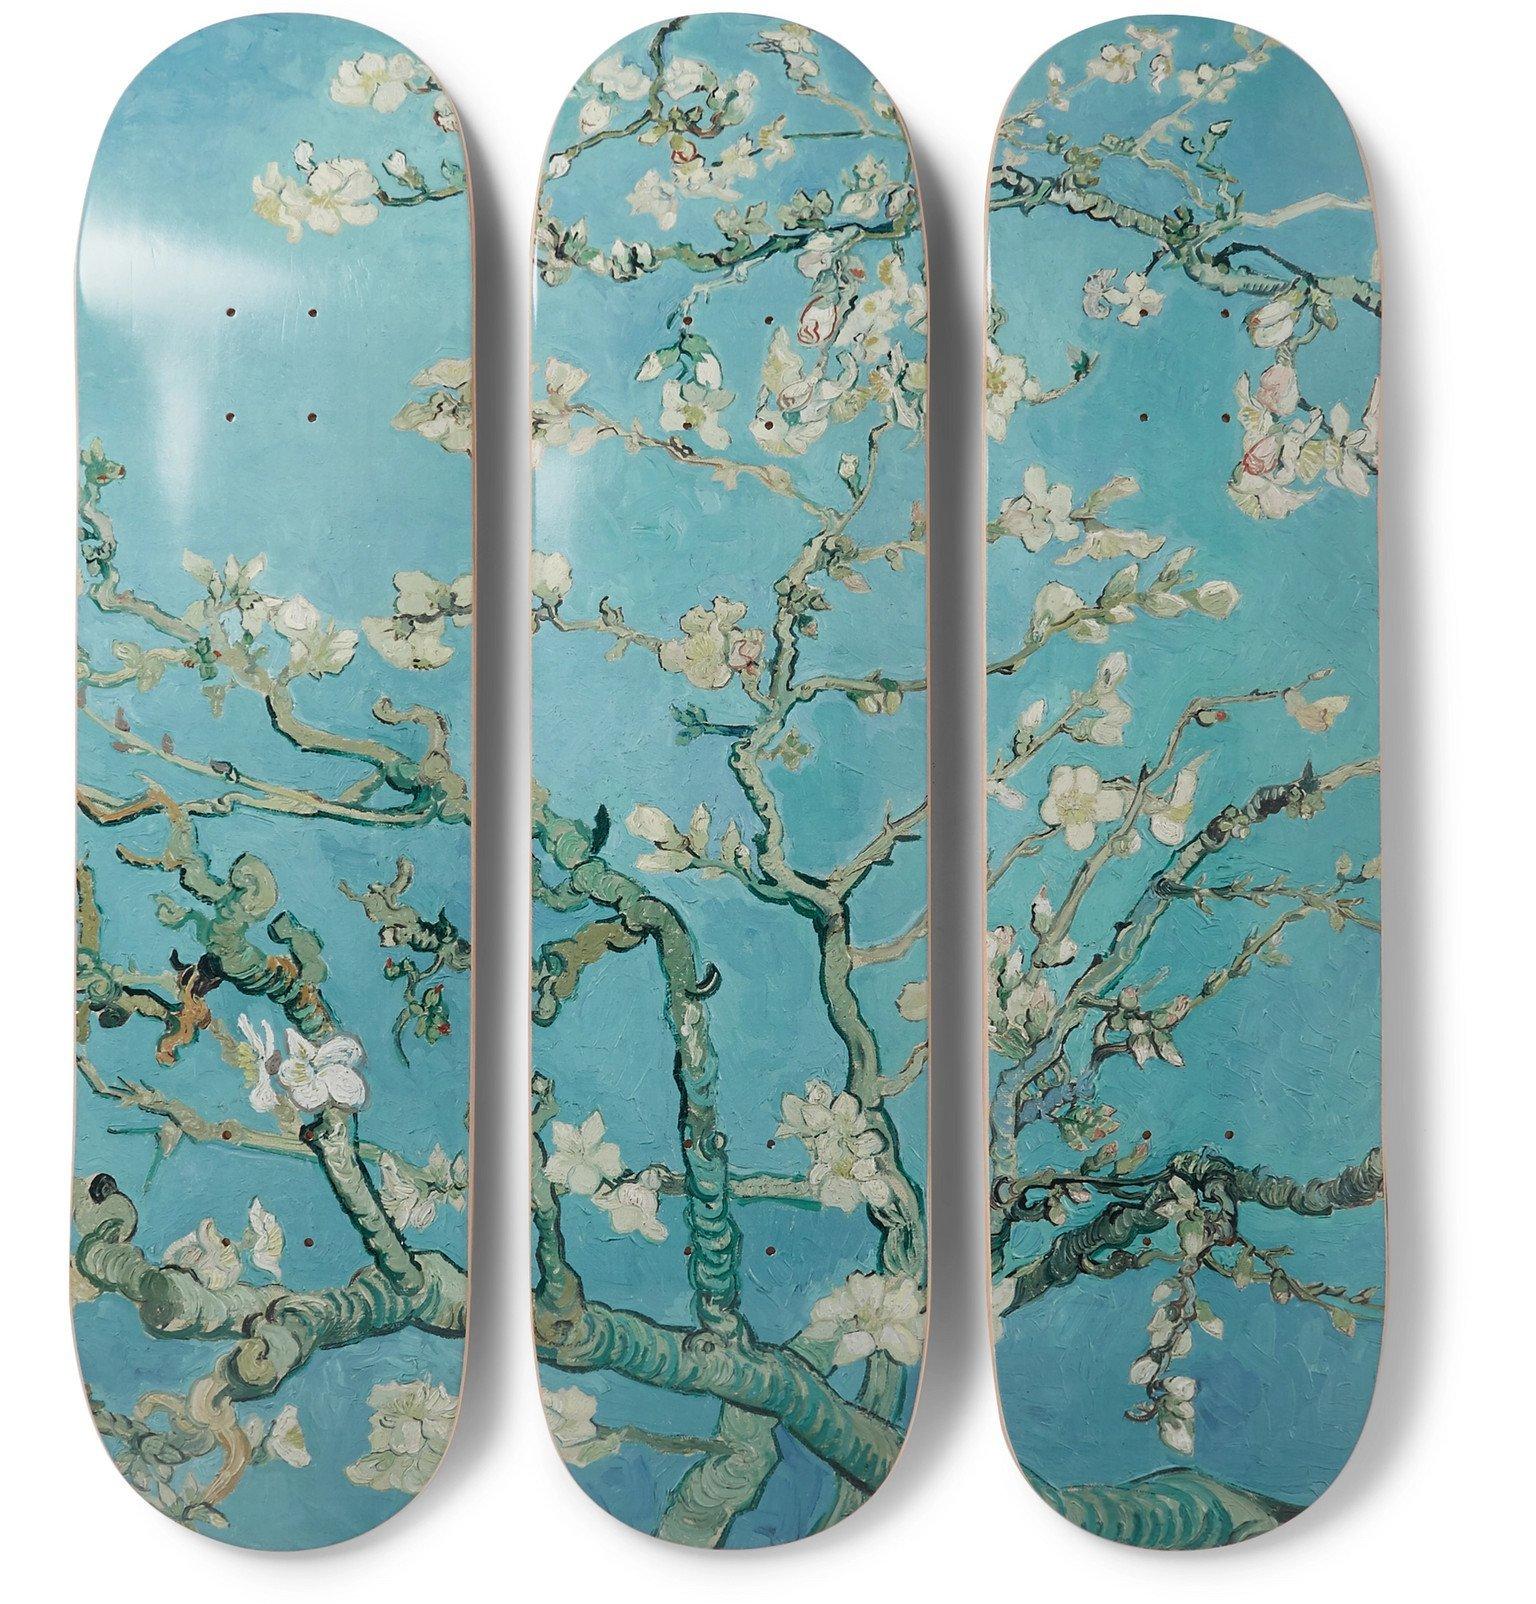 Photo: The SkateRoom - Vincent Van Gogh Set of Three Printed Skateboards - Blue